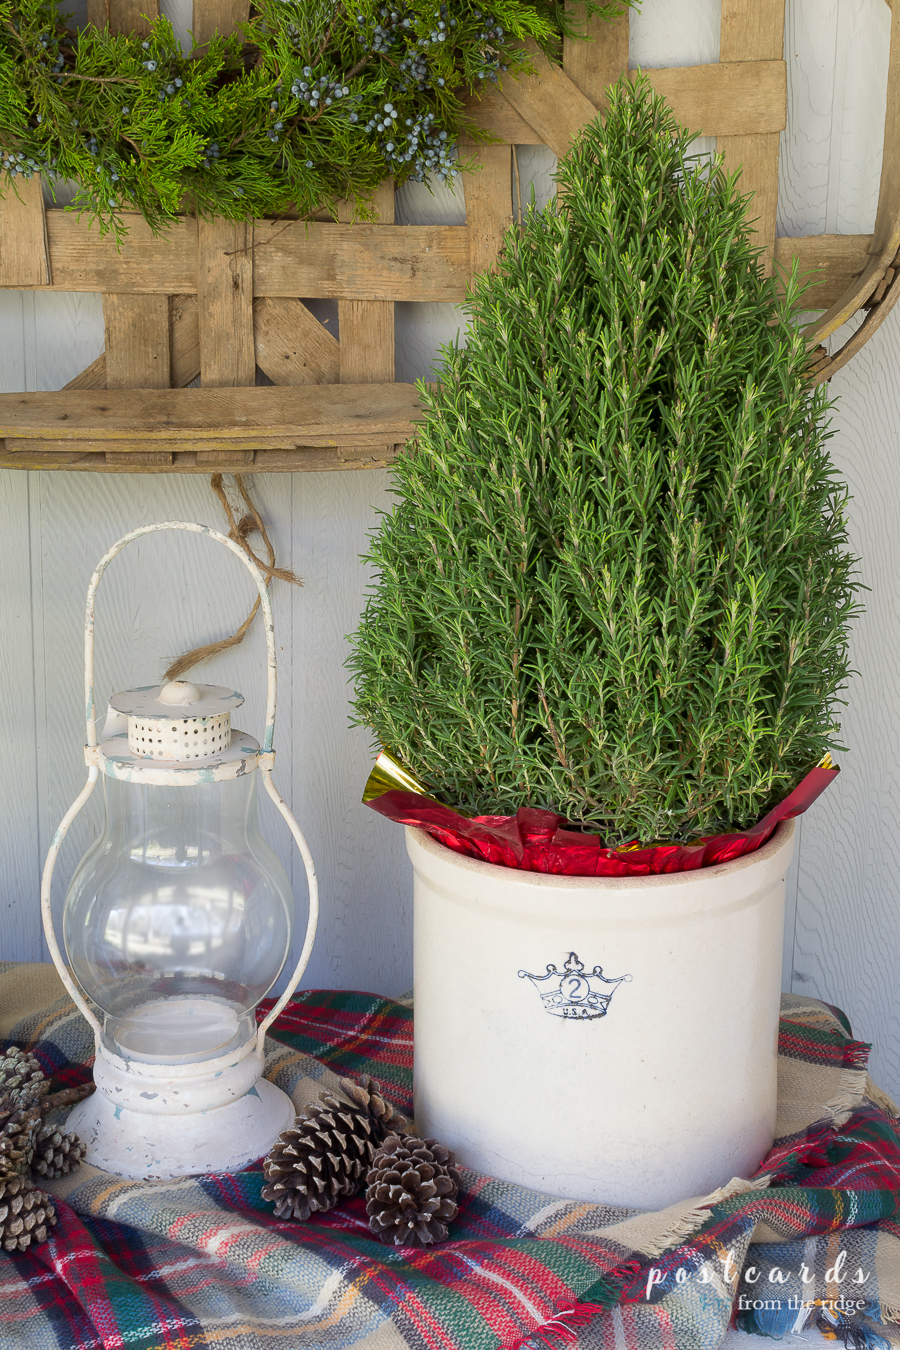 Rosemary tree and railroad lantern for Christmas decor